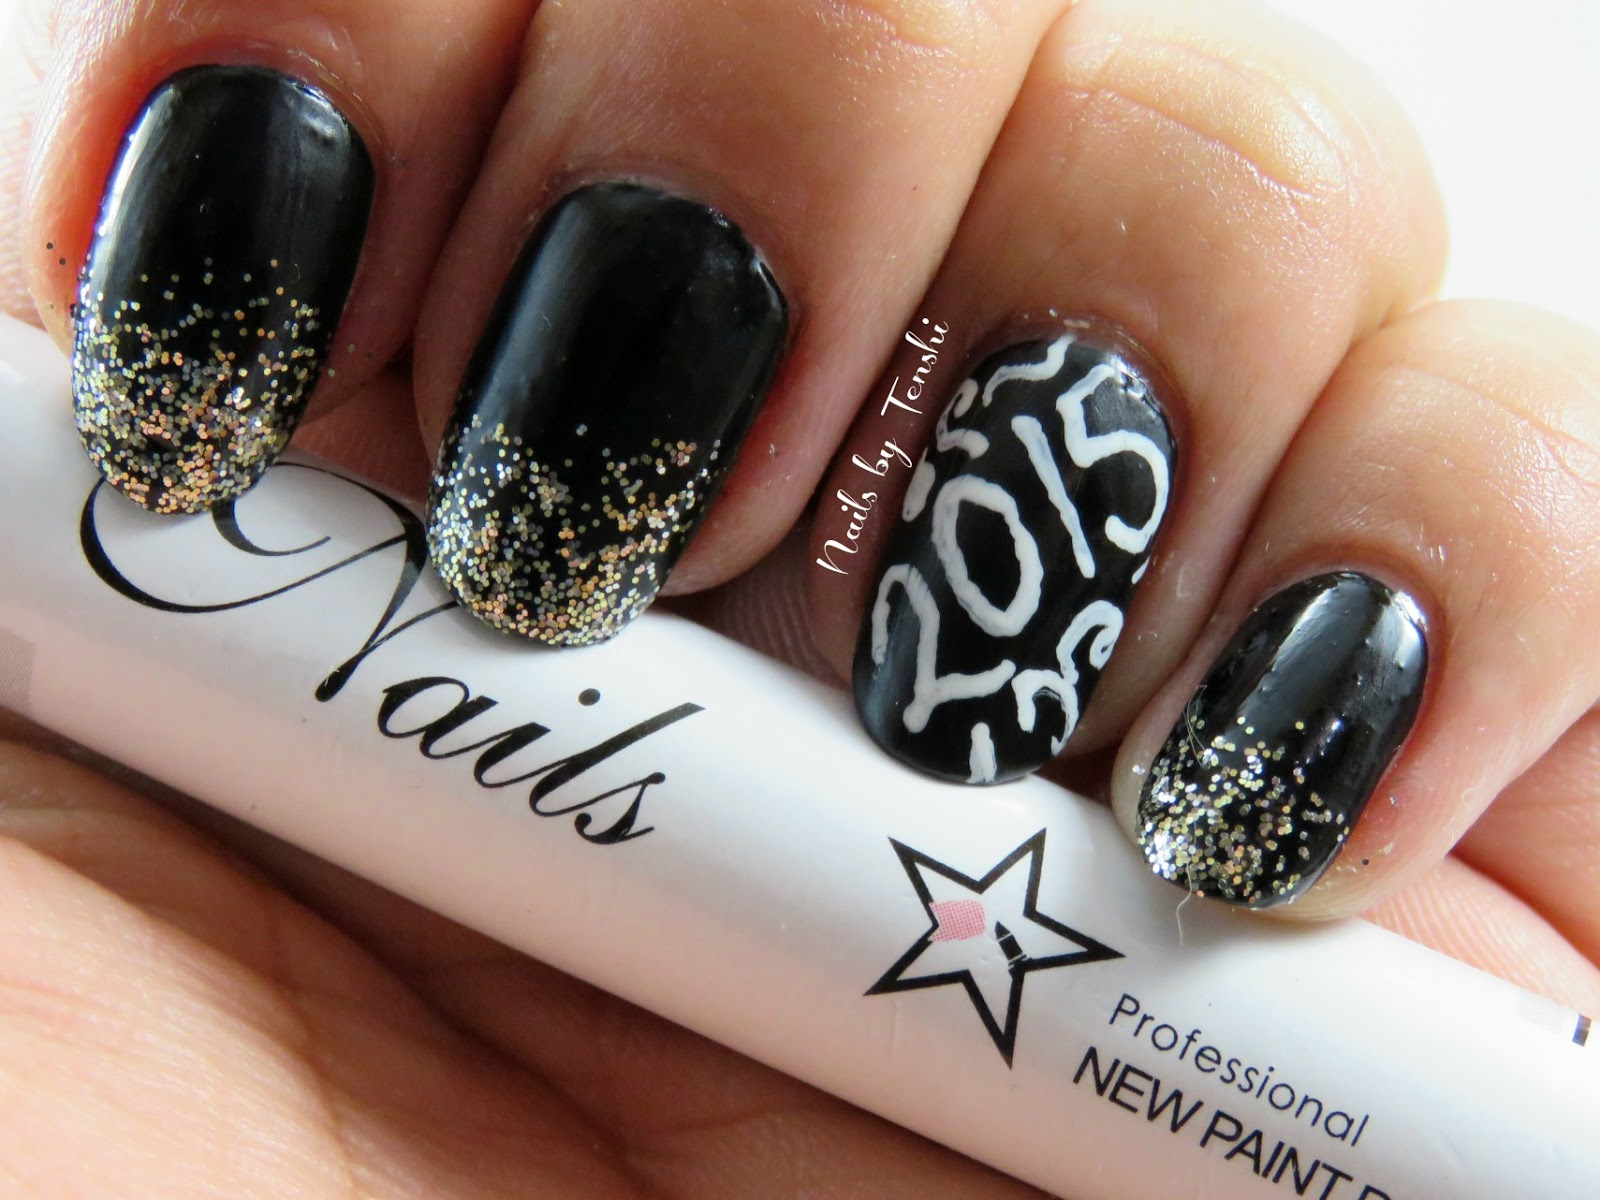 Nails by Tenshi